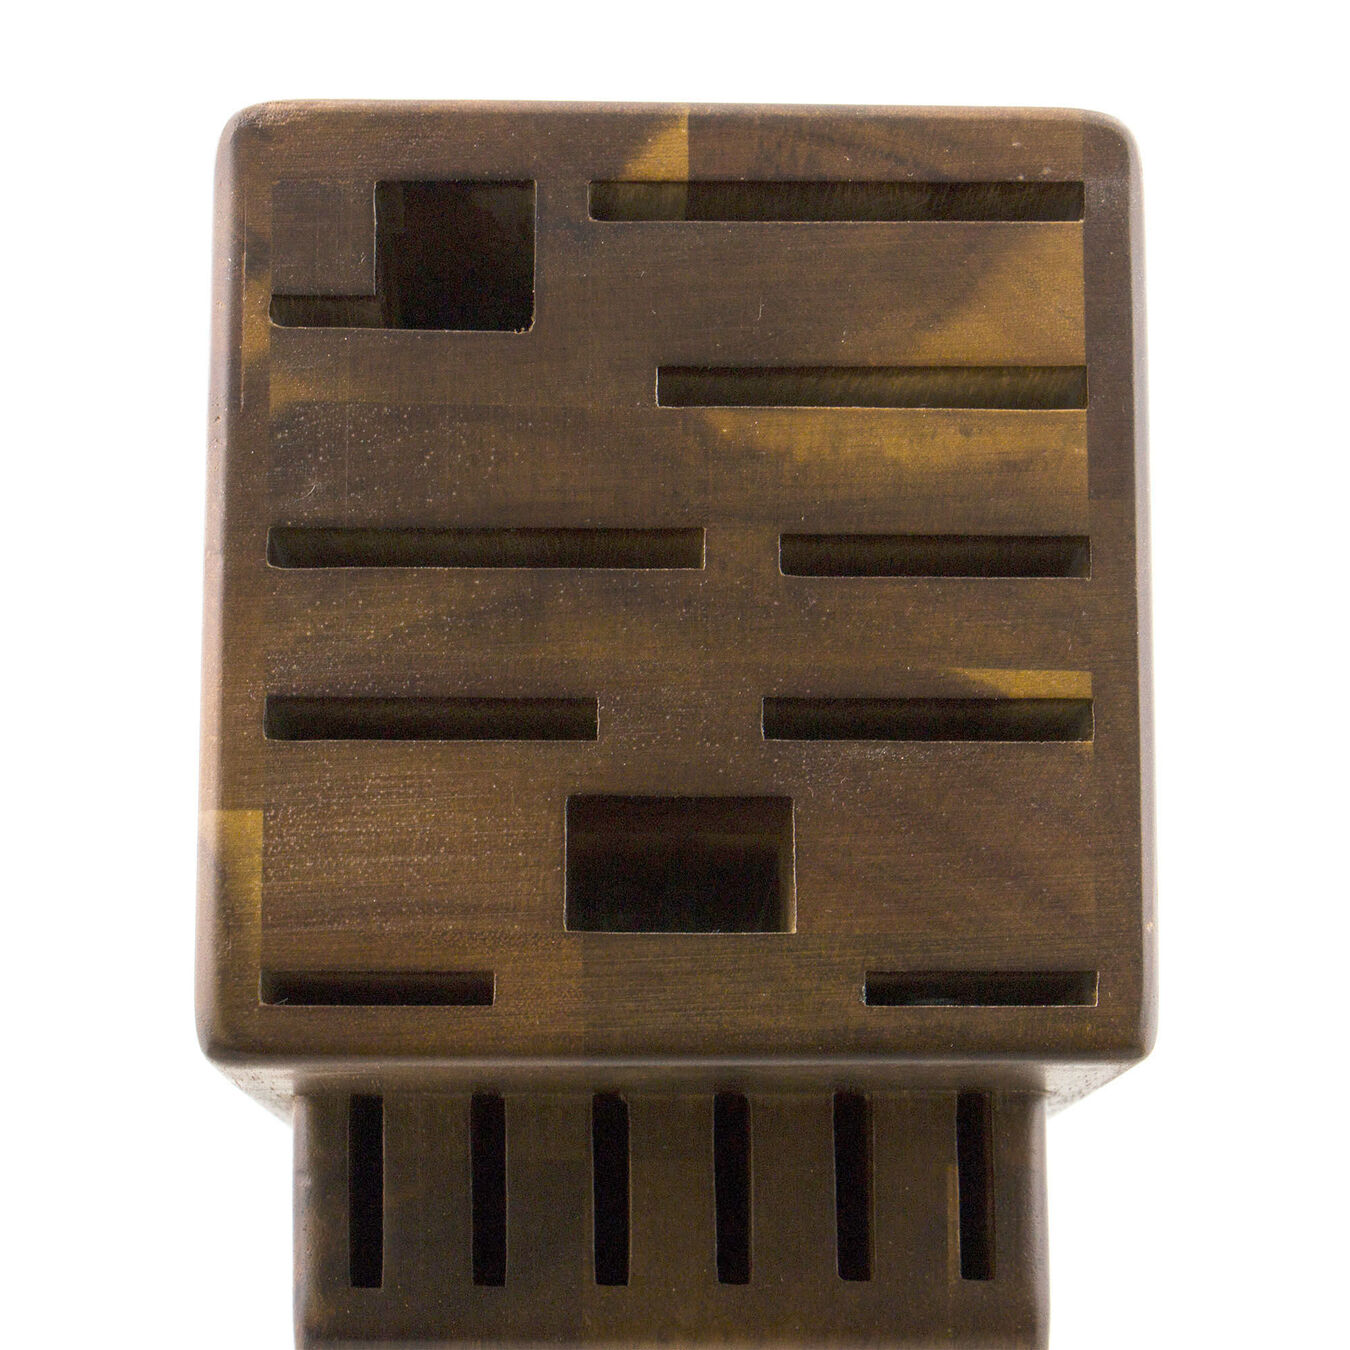 Acacia 16-slot block,,large 3